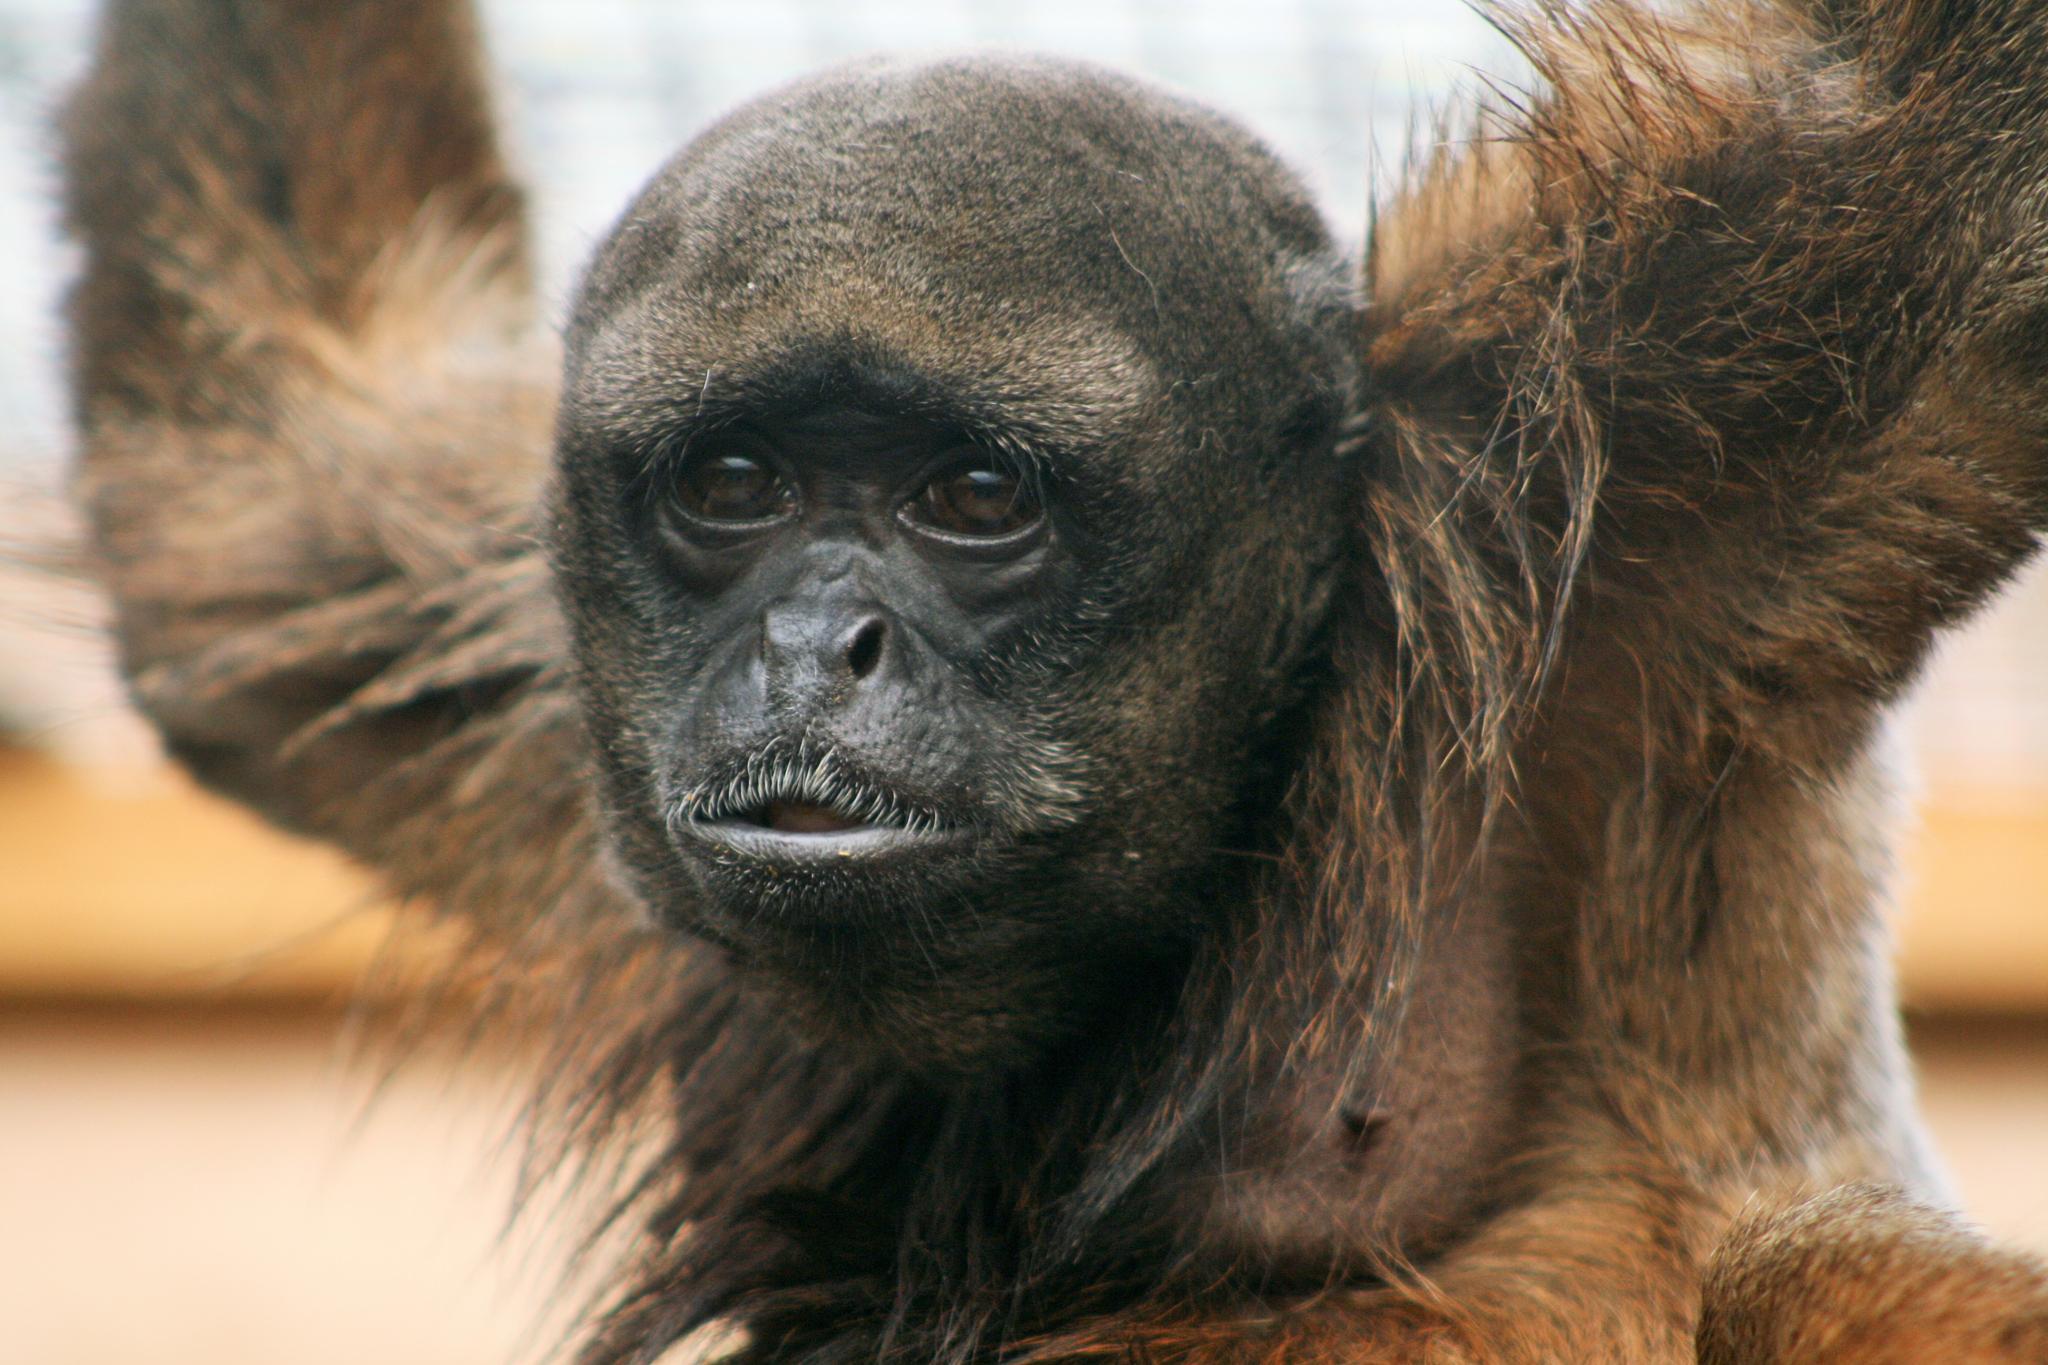 Monkey by Geoffrey Ackers